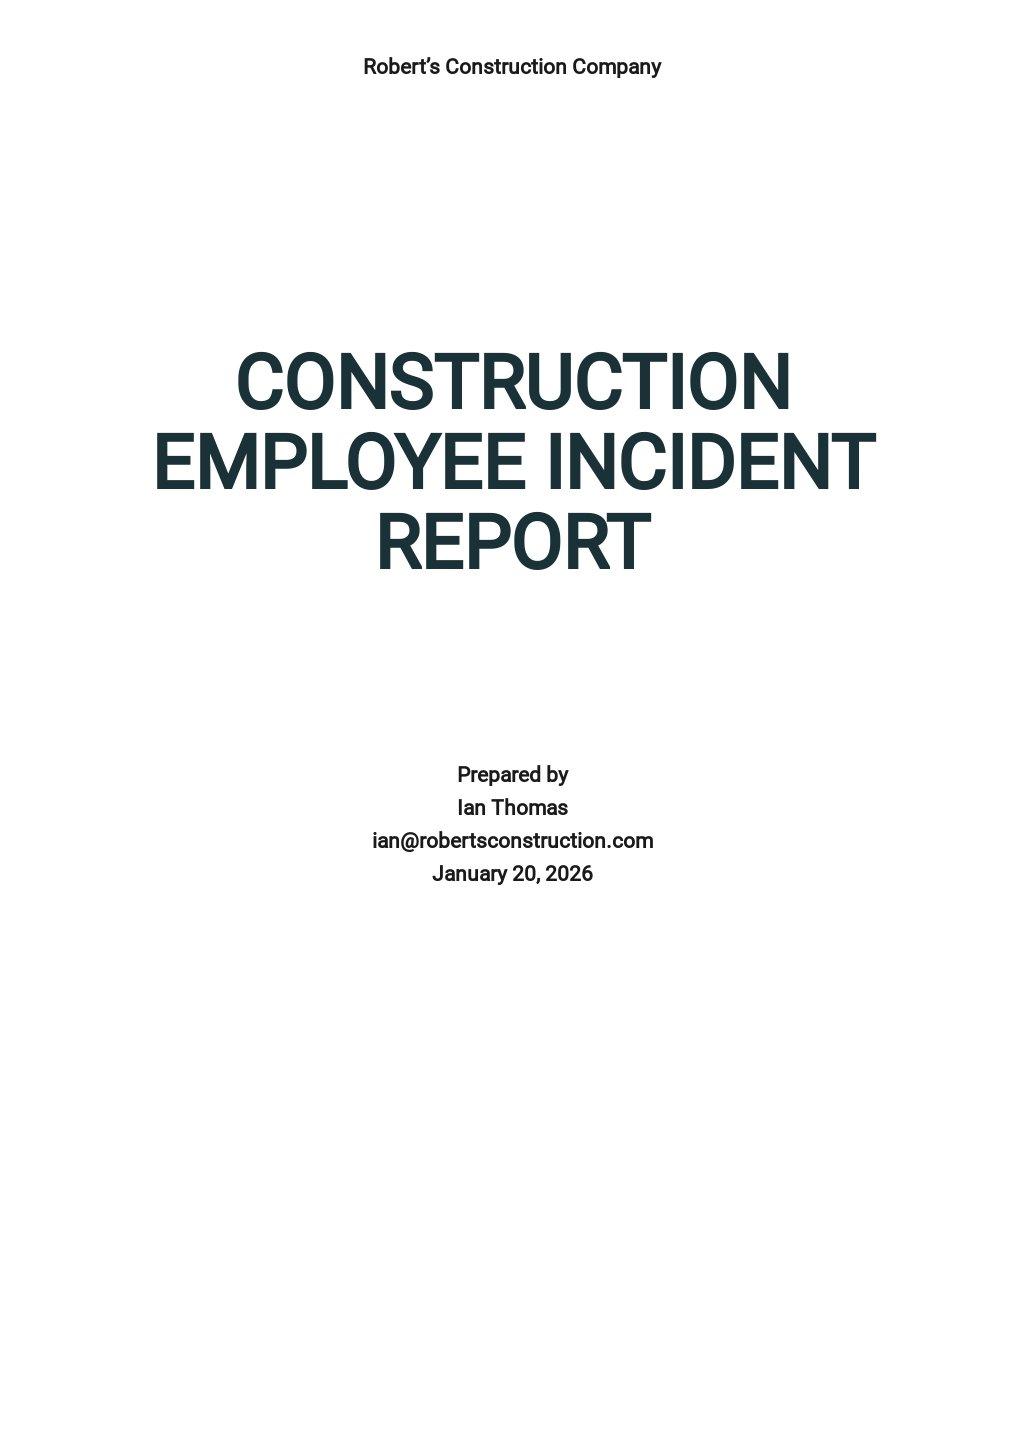 Construction Employee Incident Report Template